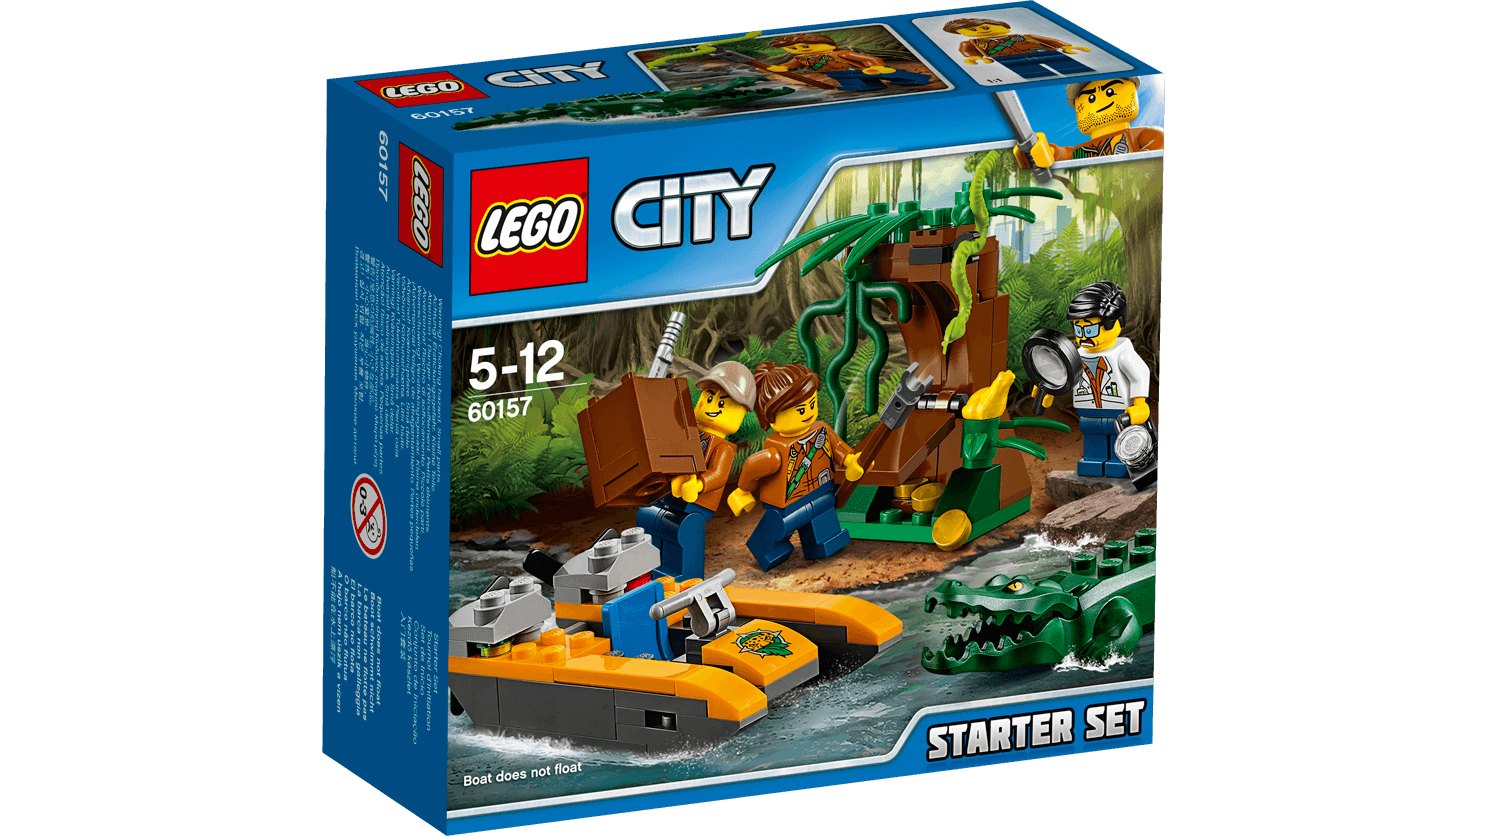 LEGO CITY JUNGLE STARTER SET 88PCS/PZS (5-12AGE/EDADES) 60157